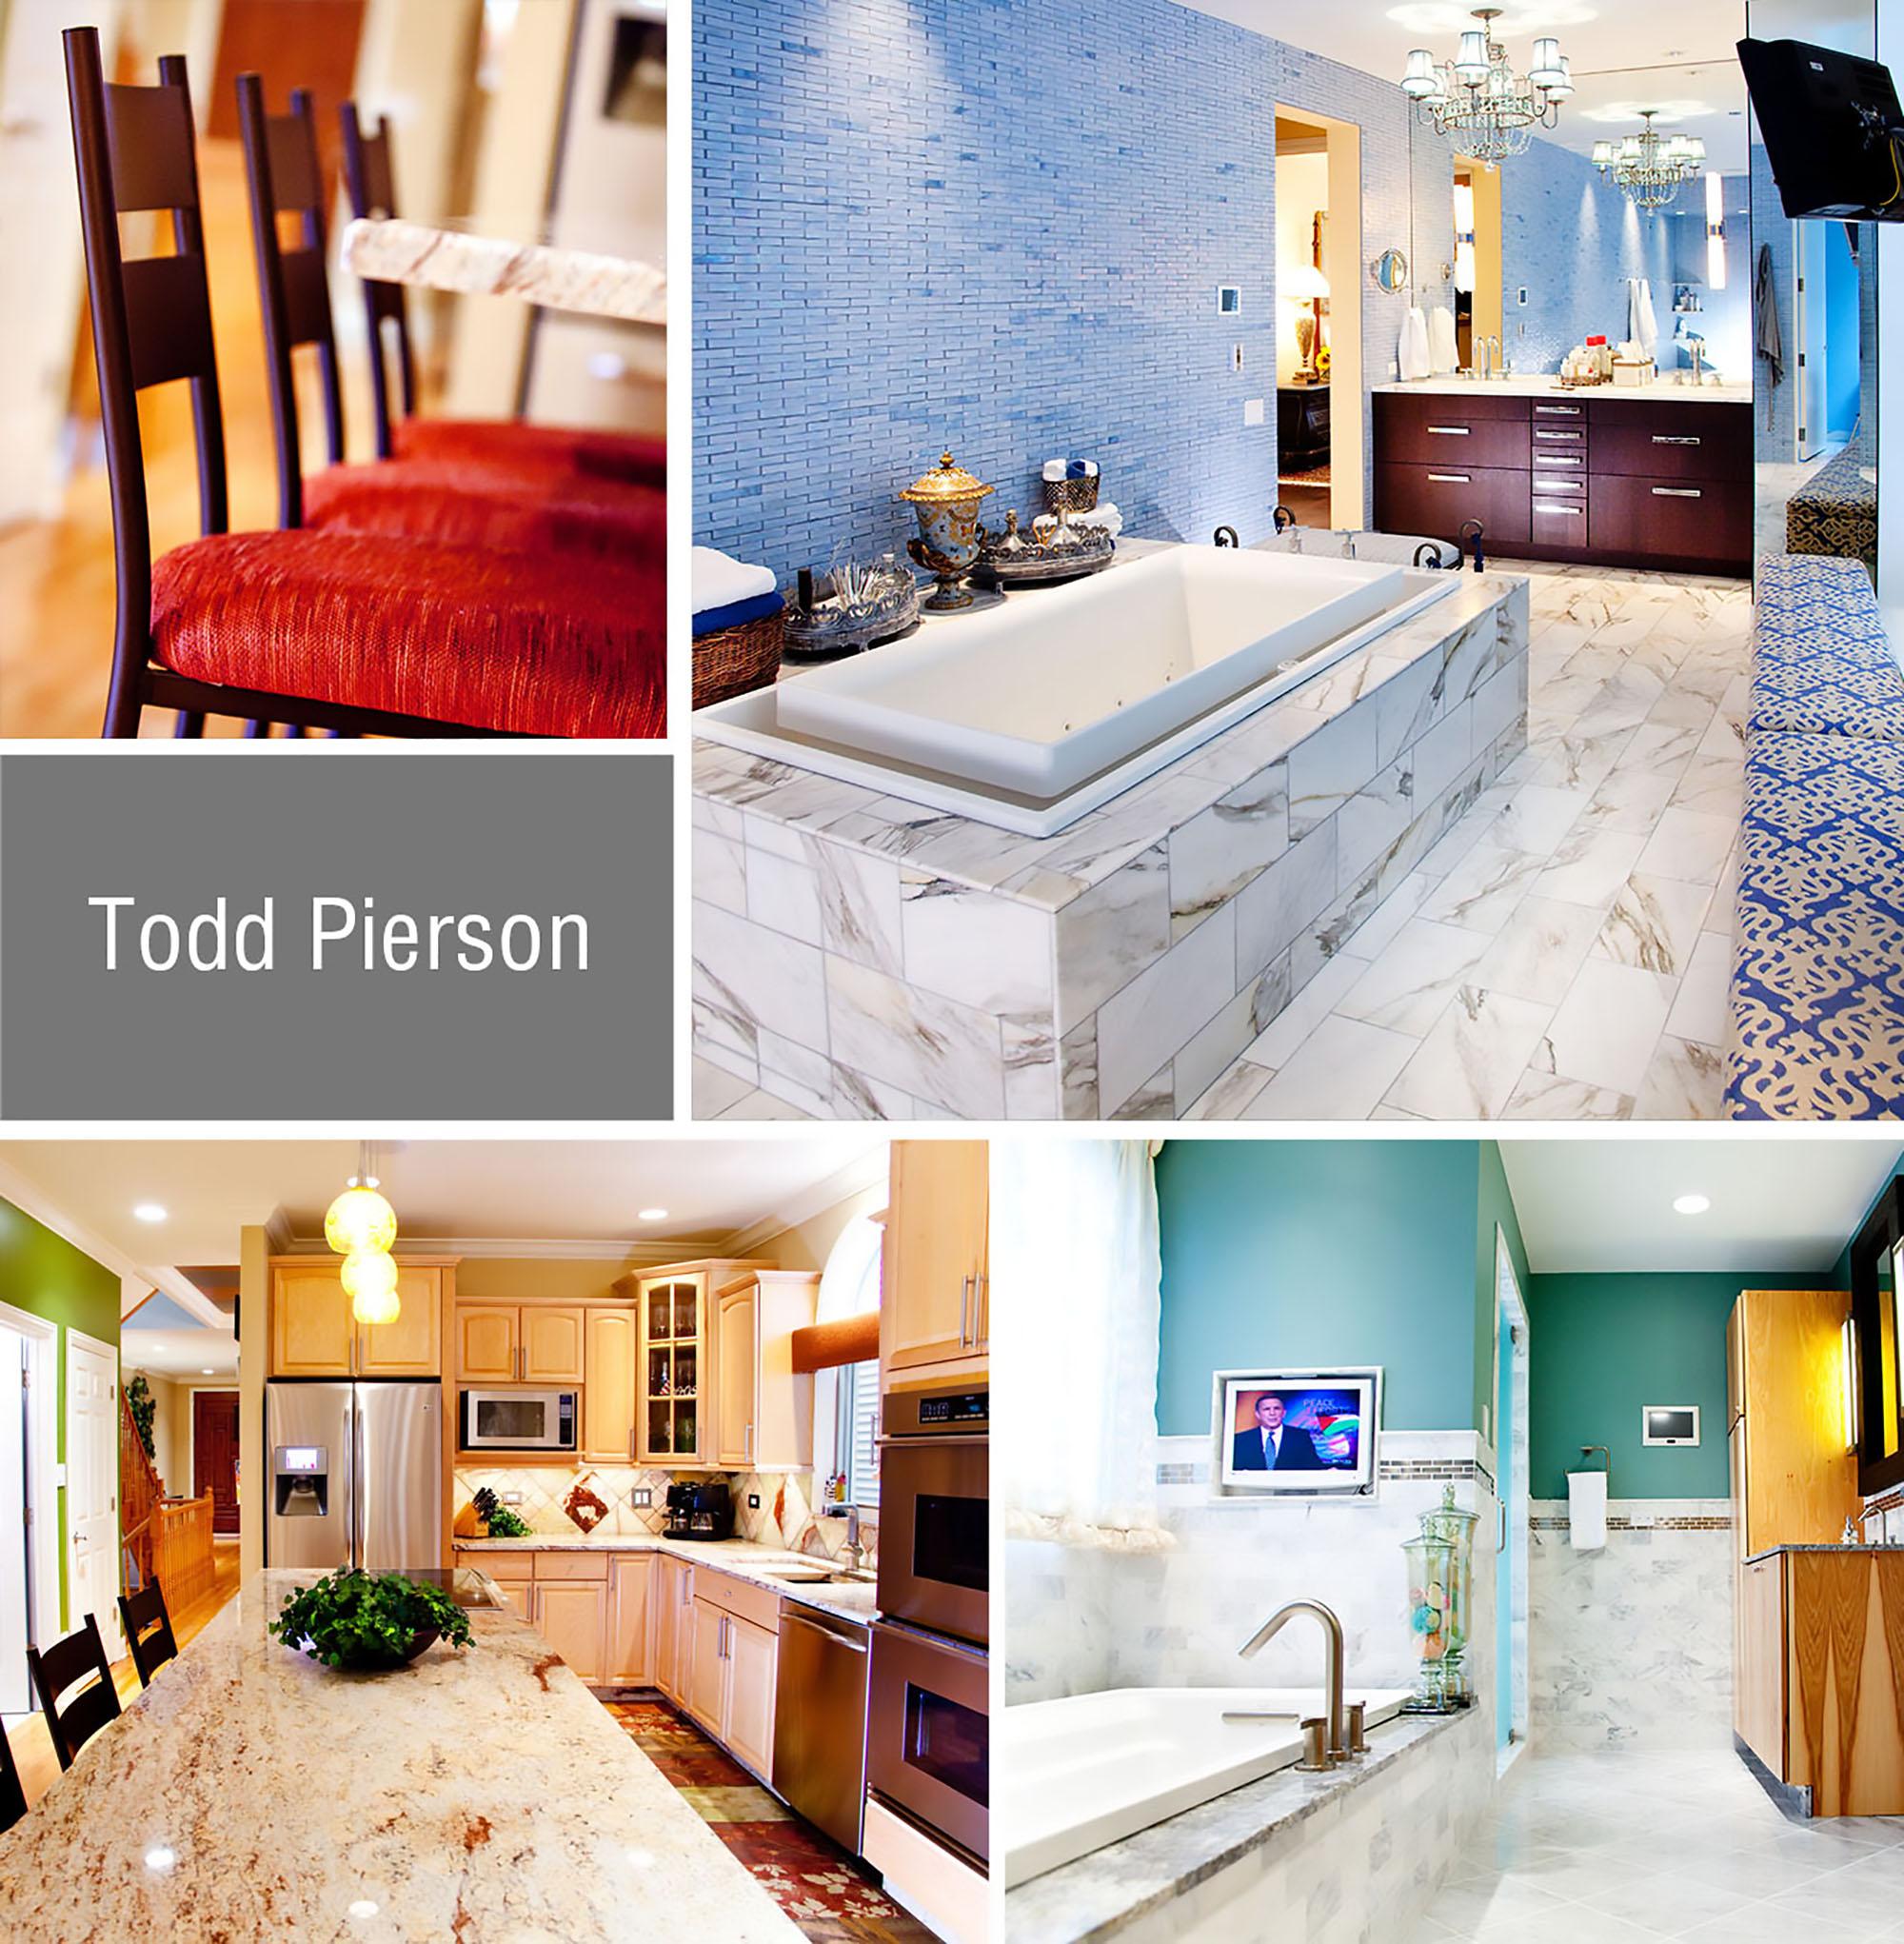 interiors2-2-2.jpg